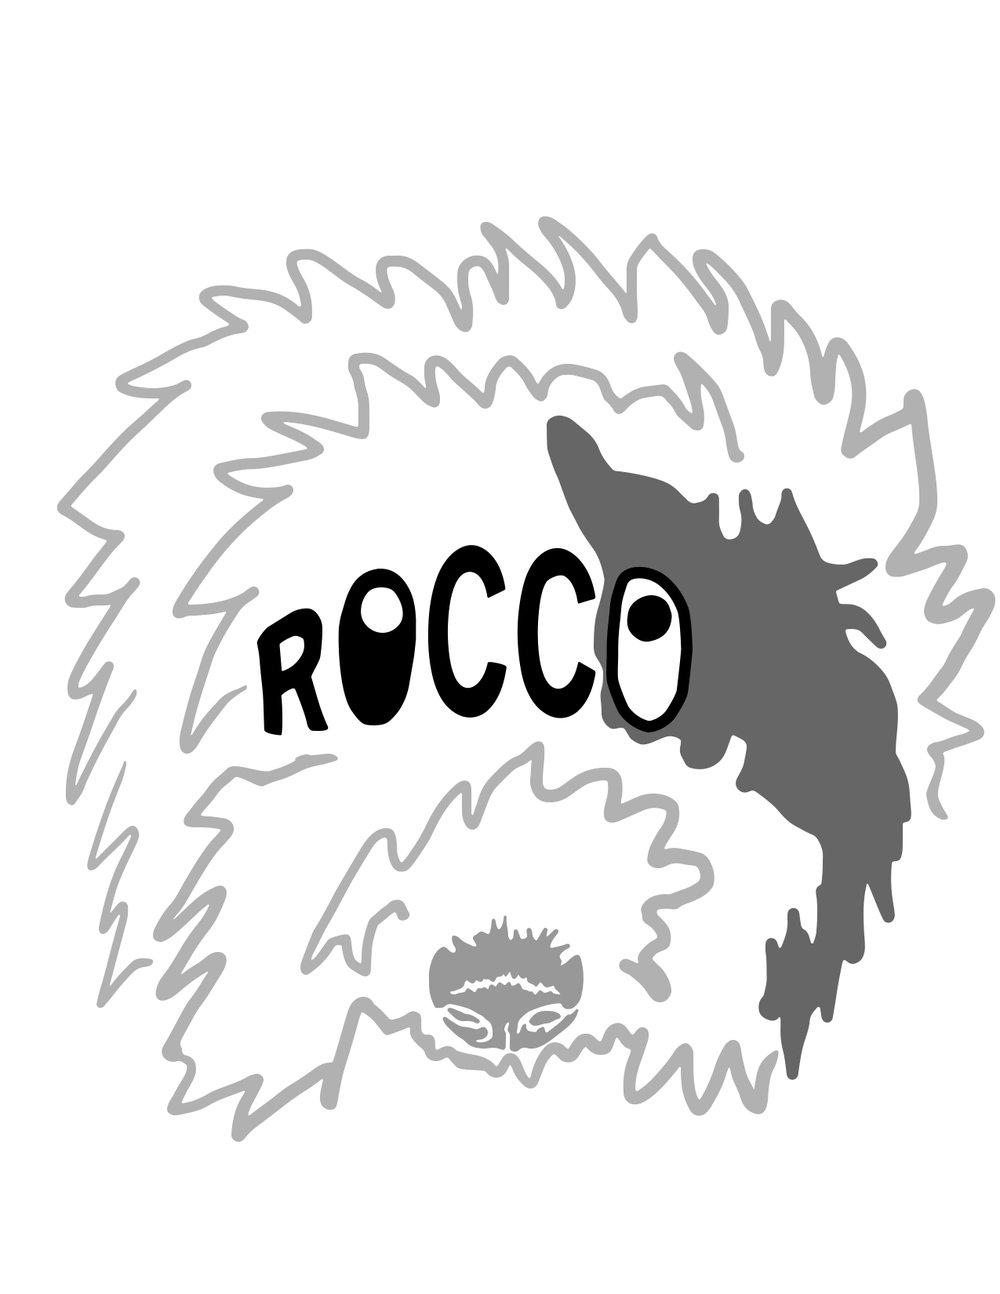 ROCCO_LOGO!_GIF.jpg